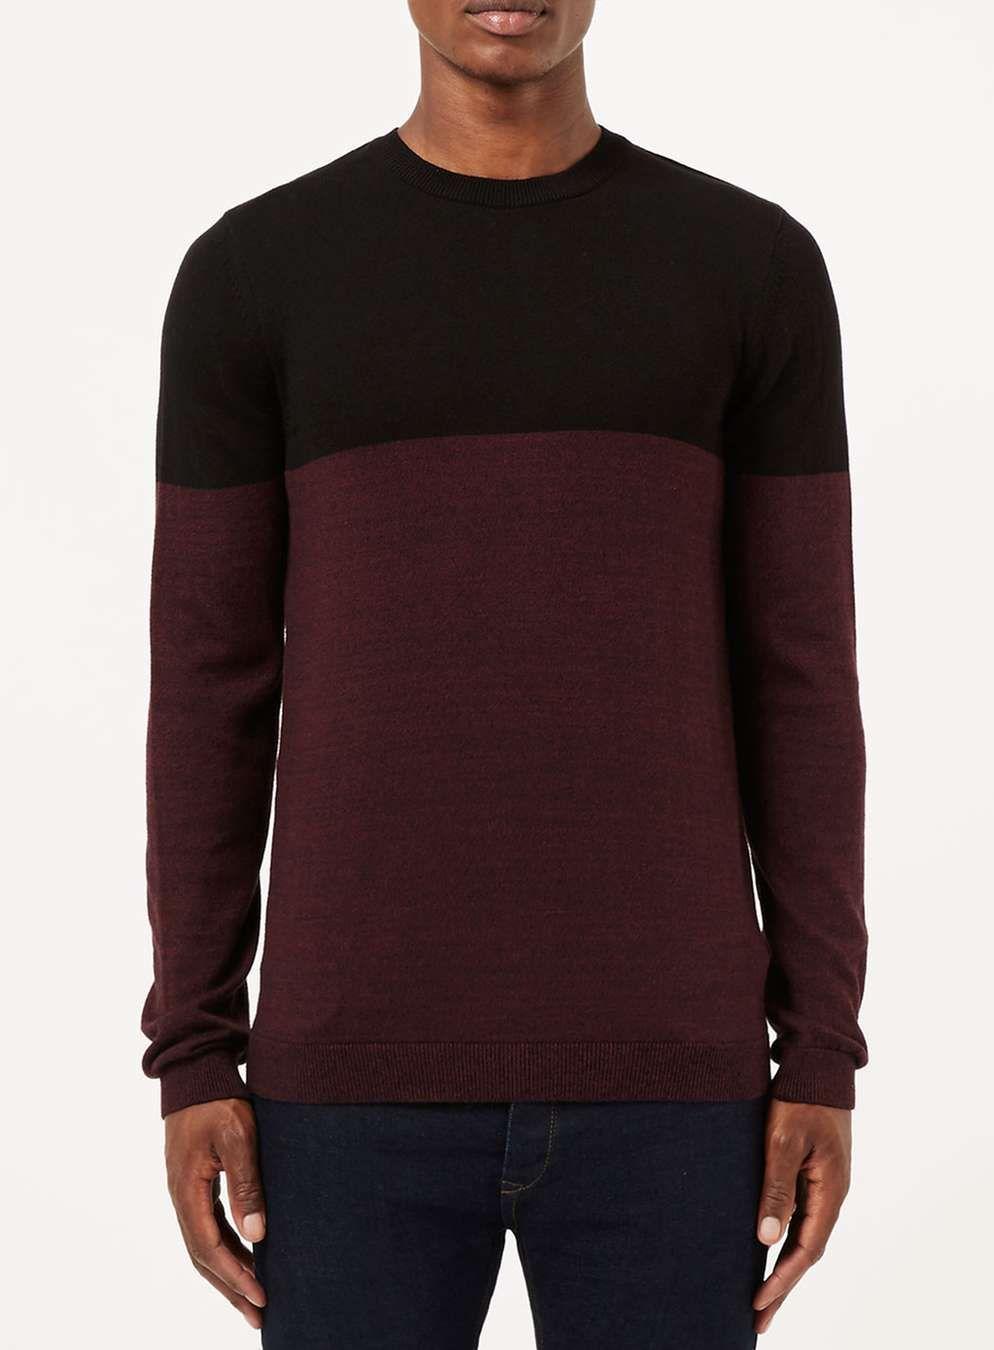 Black and Burgundy Colour Block Jumper - Men's Tops - Clothing ...